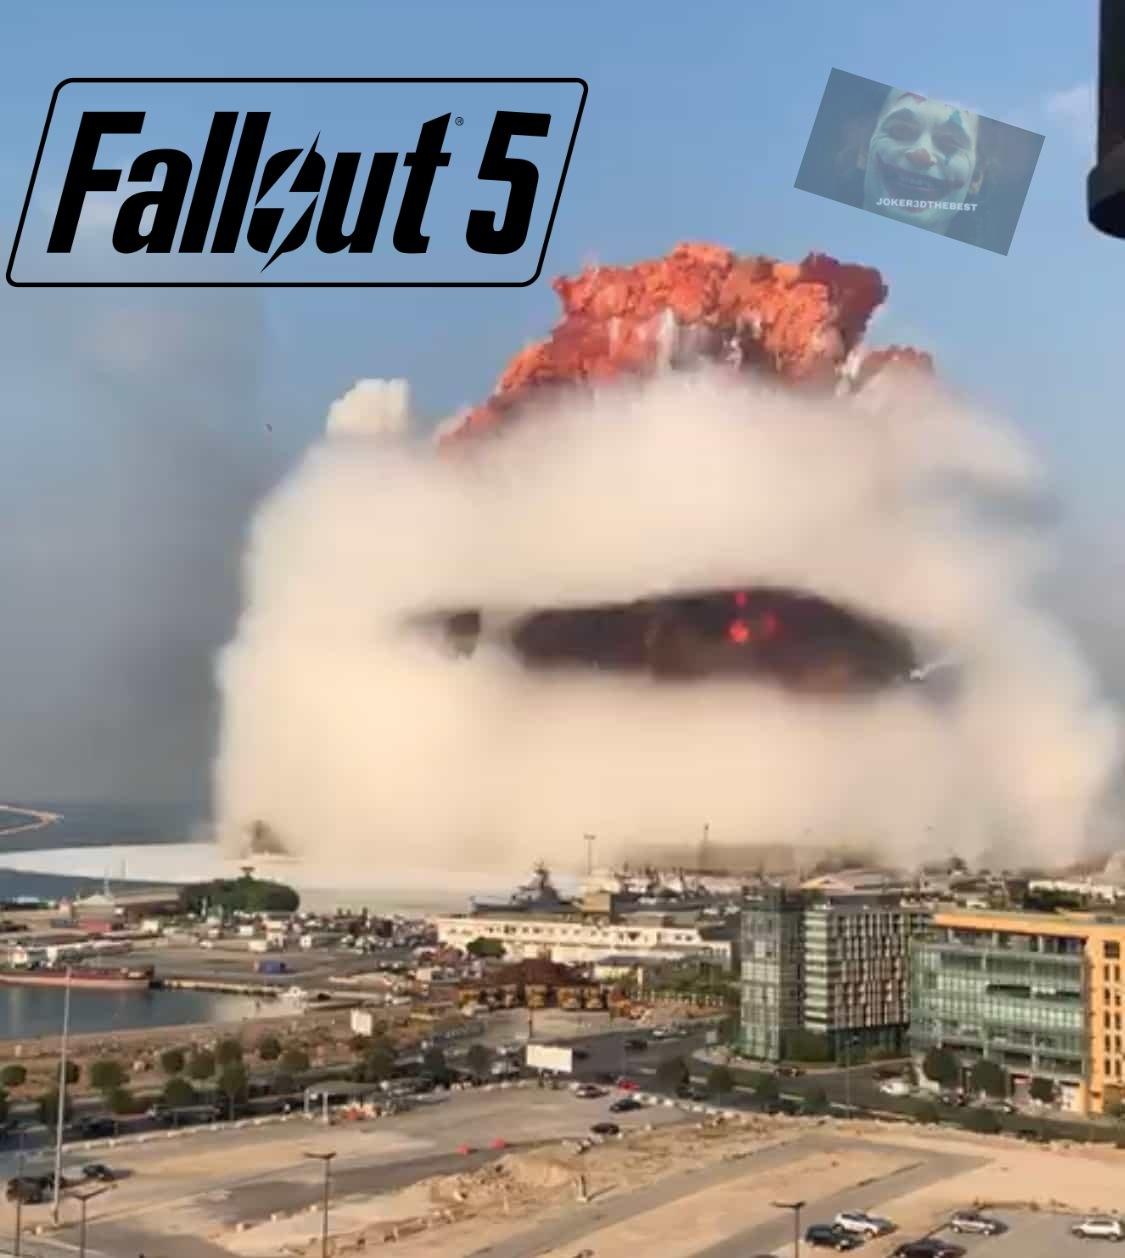 Mejor que el fallout 76? - meme